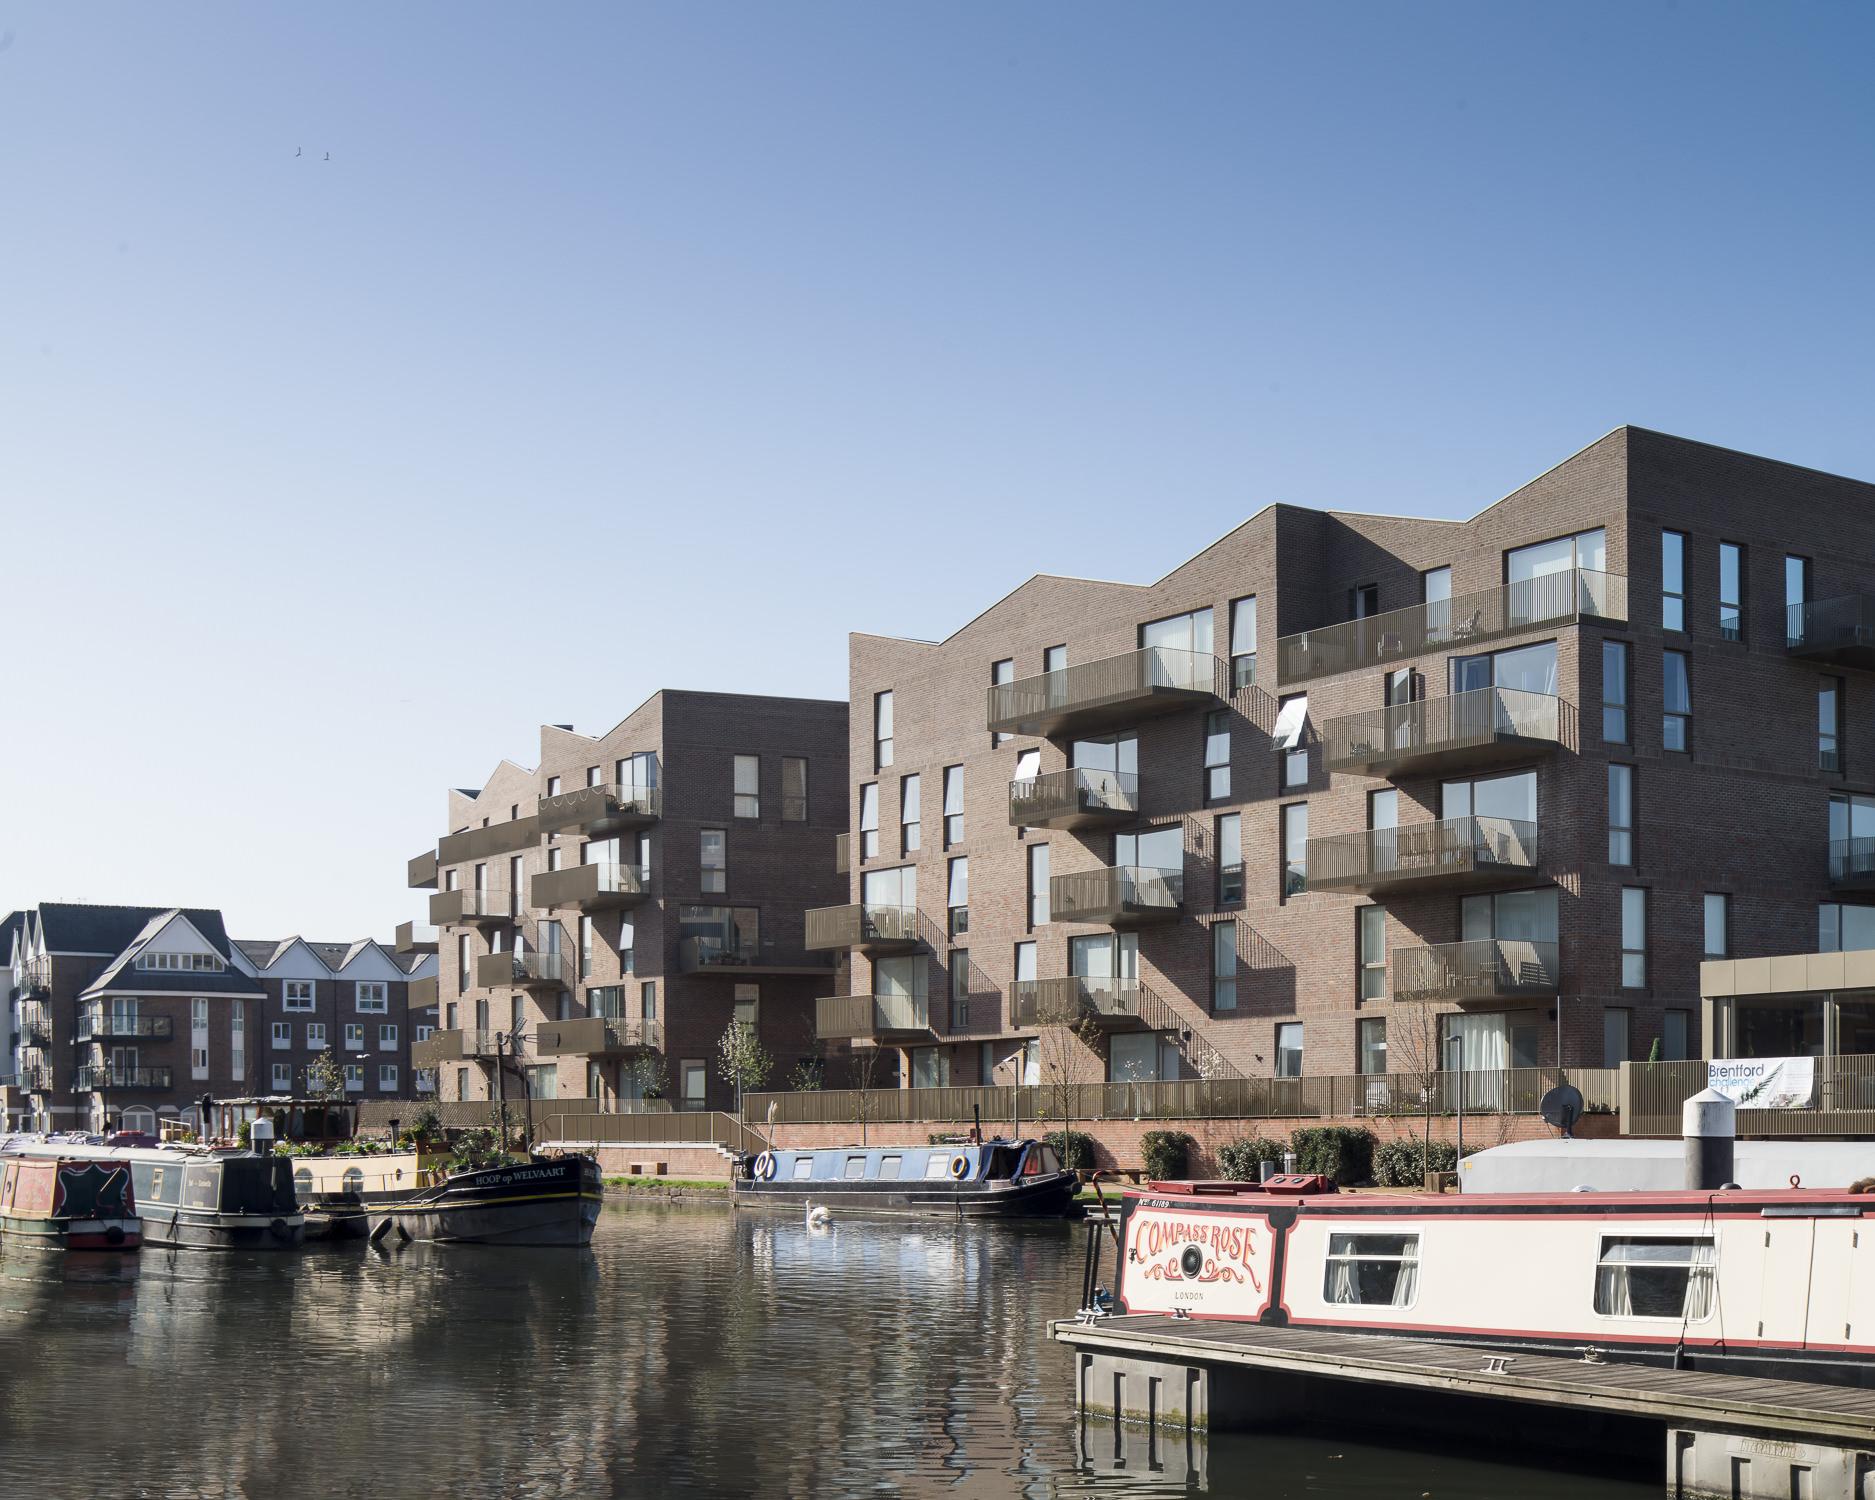 duggan-morris-brenrtford-lock-mark-hadden-amsterdam-architecture-photographer-architectuurfotograaf-025.jpg